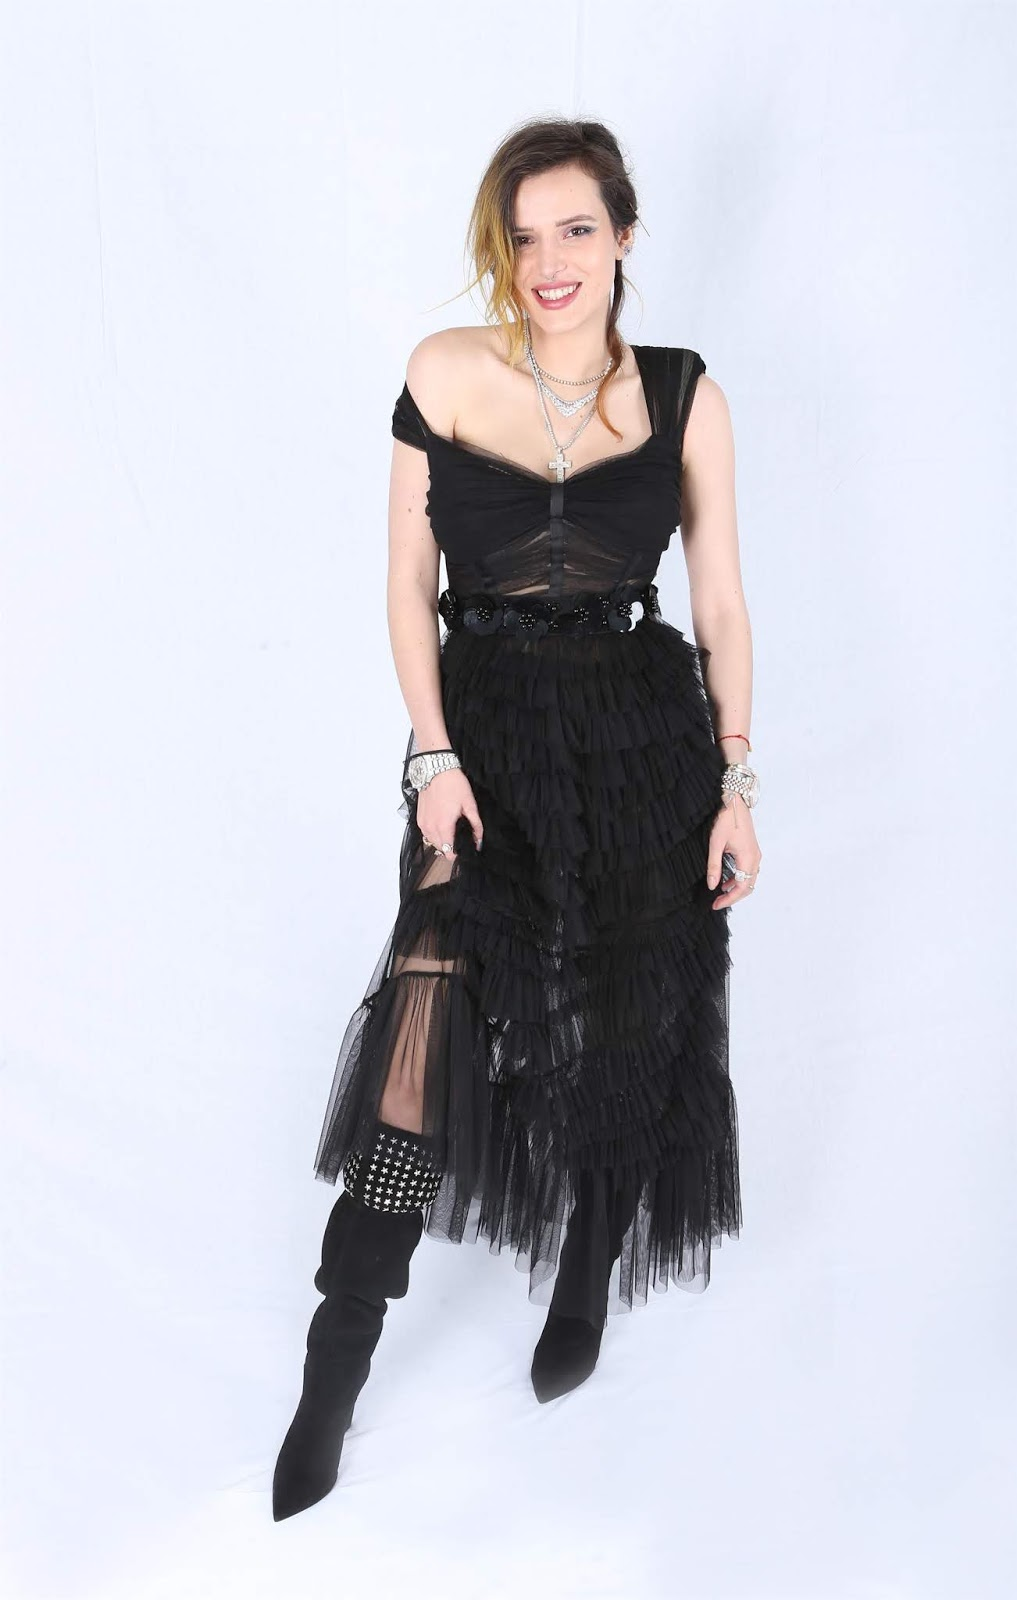 Bella Thorne - Filming Italia Private Portraits in Los Angeles - 01/31/2019